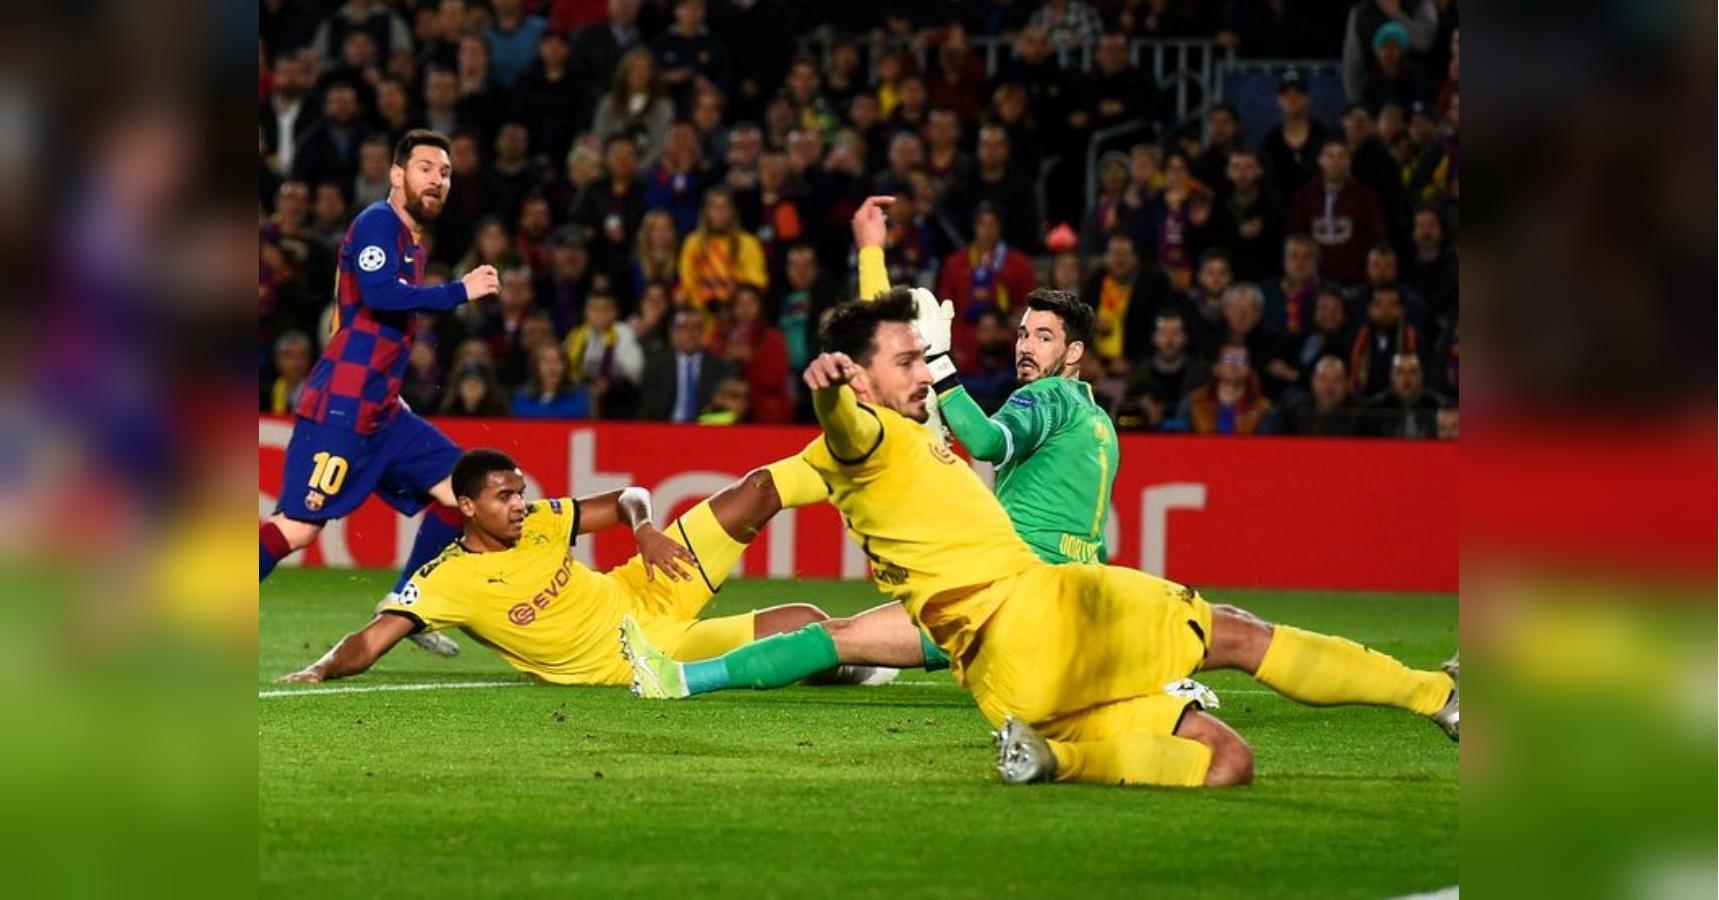 Барселона боруссия м 6 декабря онлайн трансляция